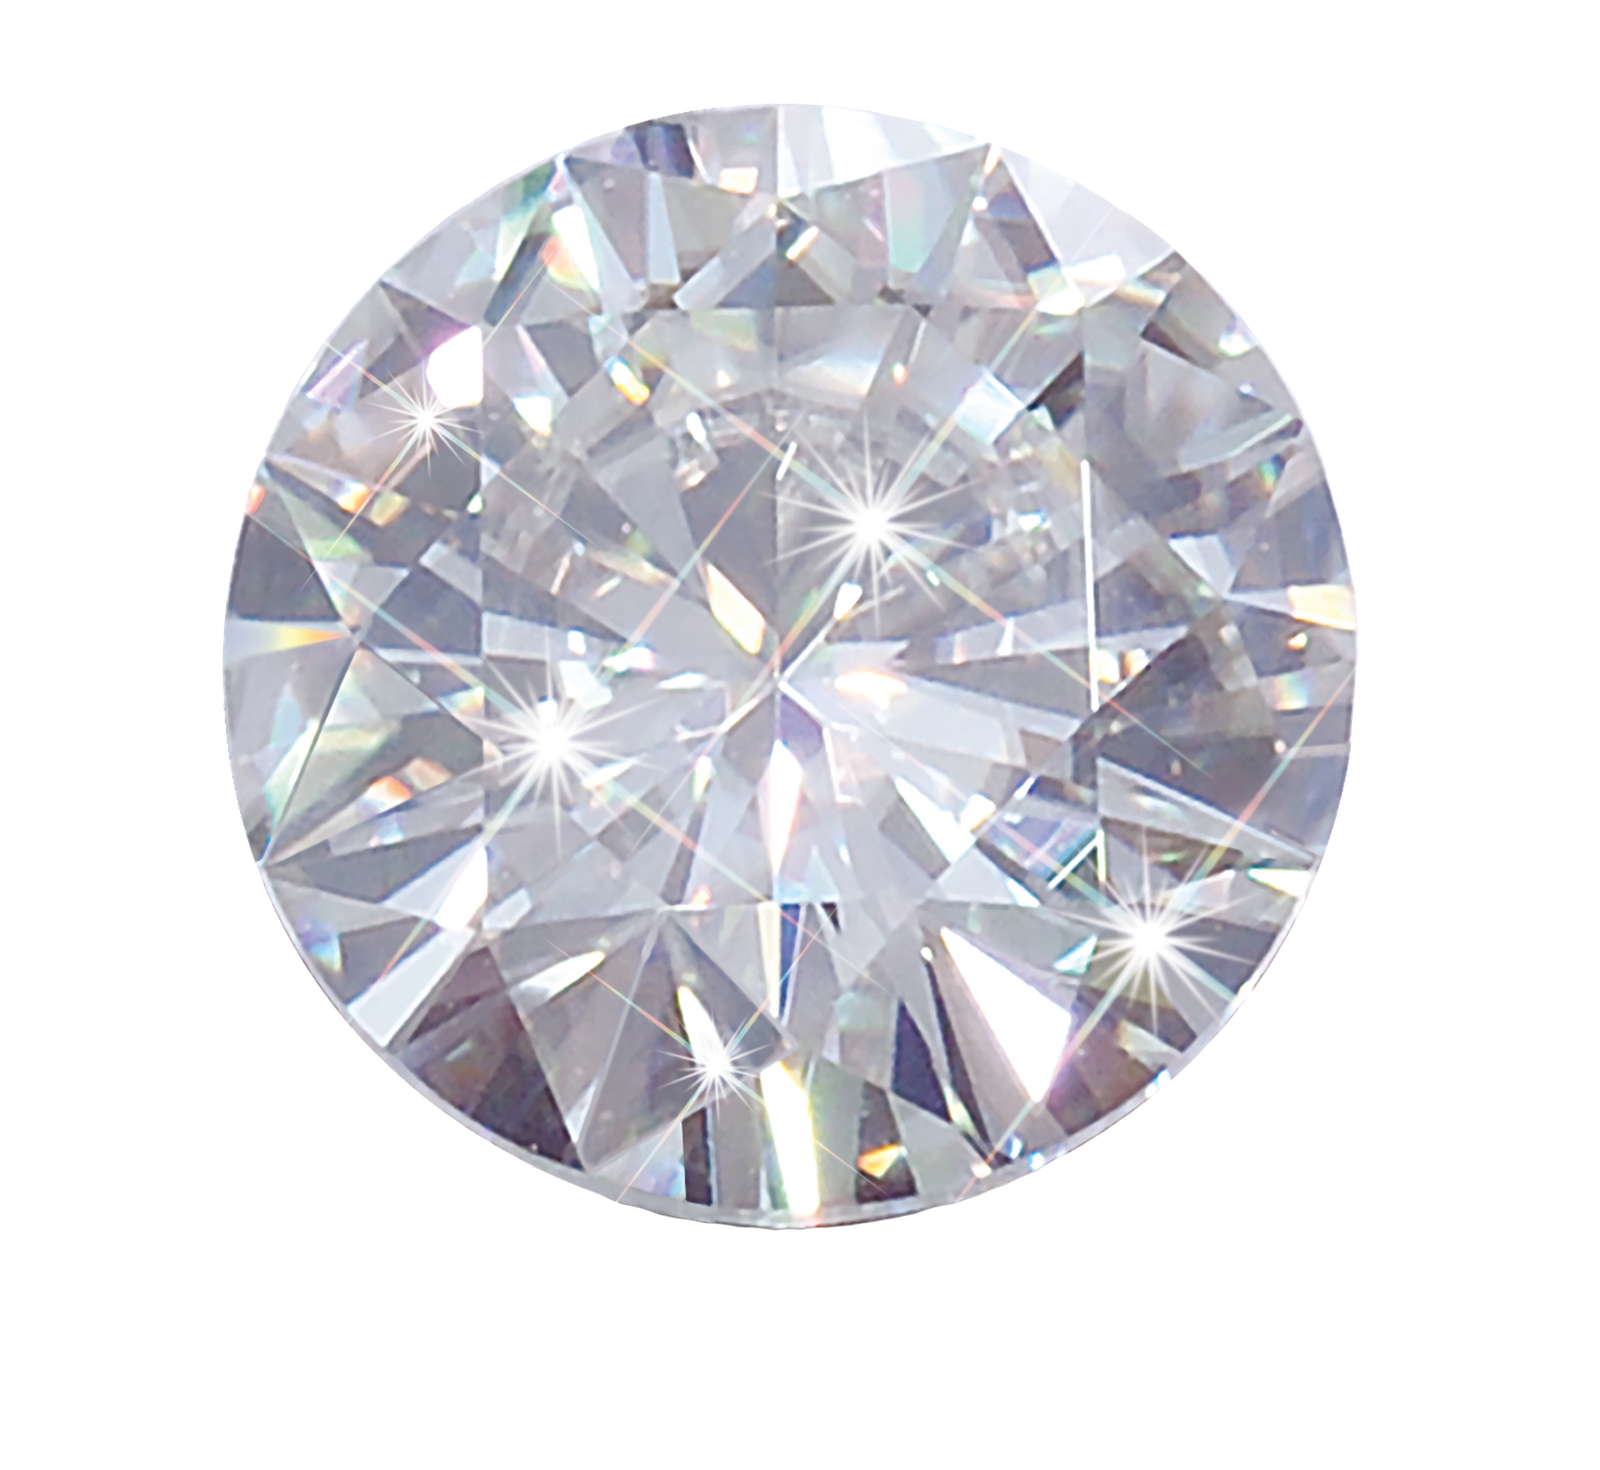 Diamond Png image #26579 - Diamond PNG